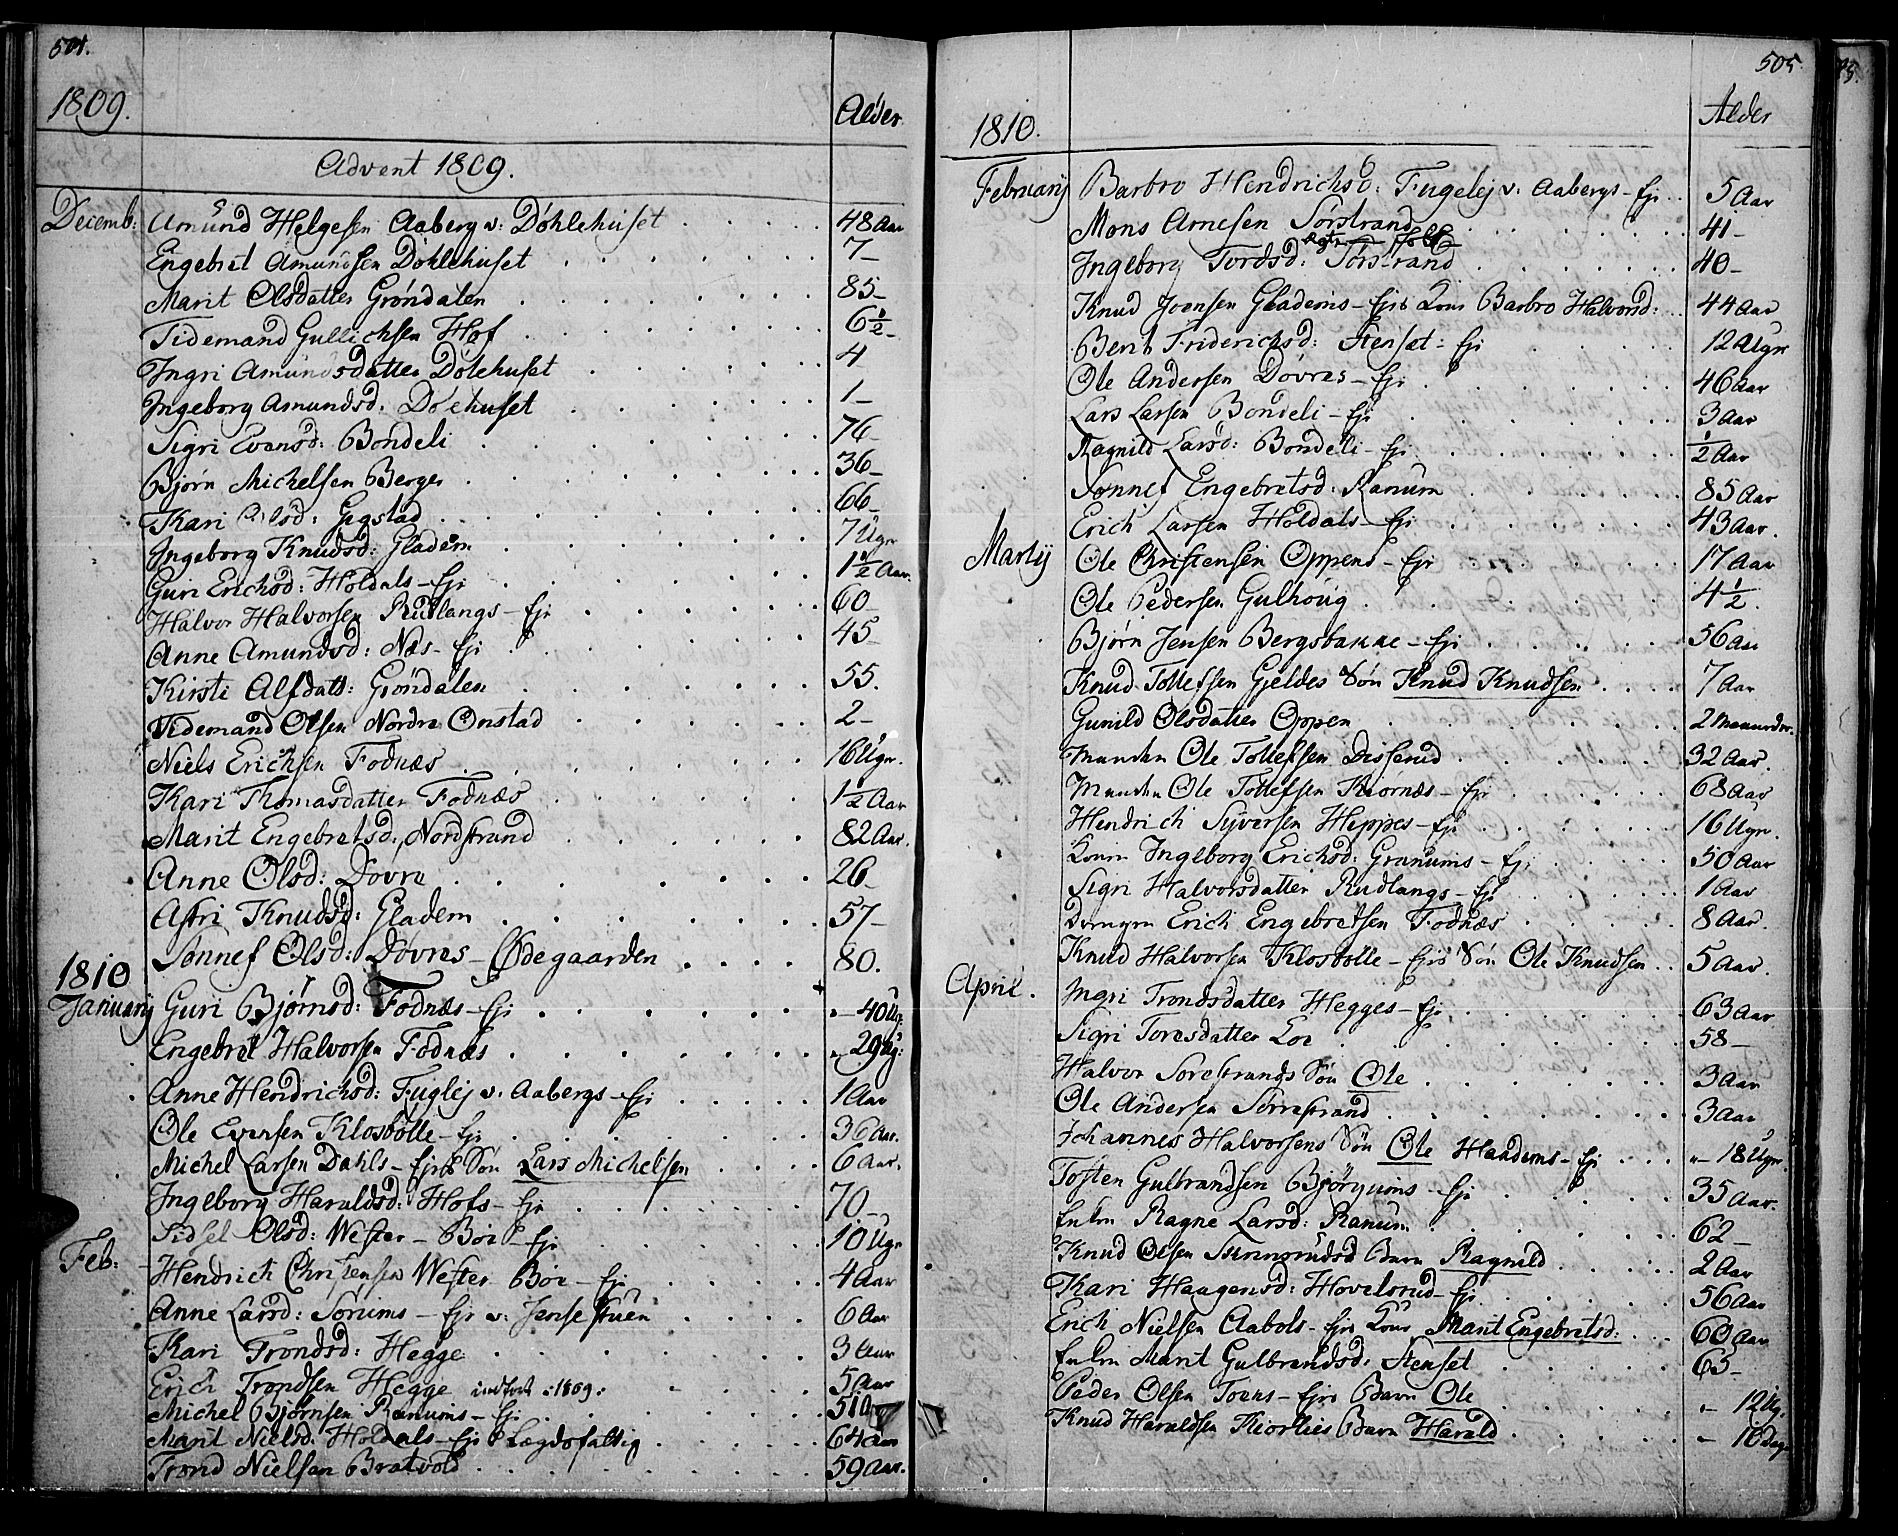 SAH, Nord-Aurdal prestekontor, Ministerialbok nr. 1, 1808-1815, s. 504-505